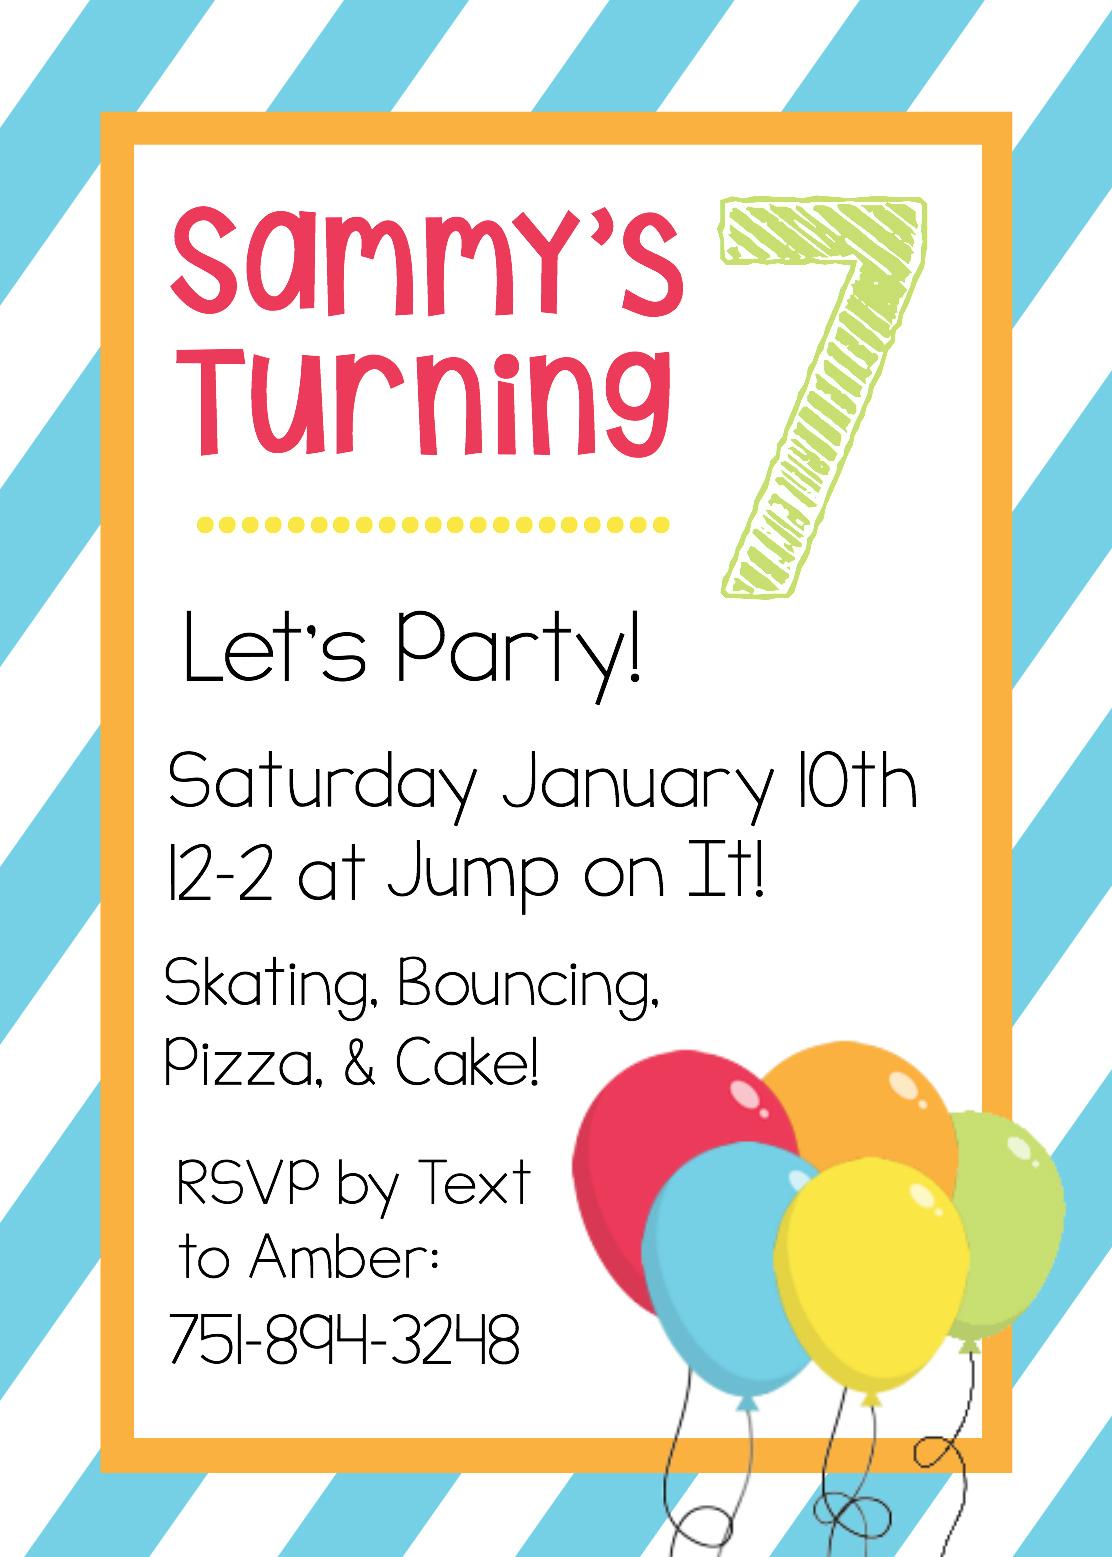 Free Printable Birthday Invitation Templates - Free Printable Animal Print Birthday Invitations